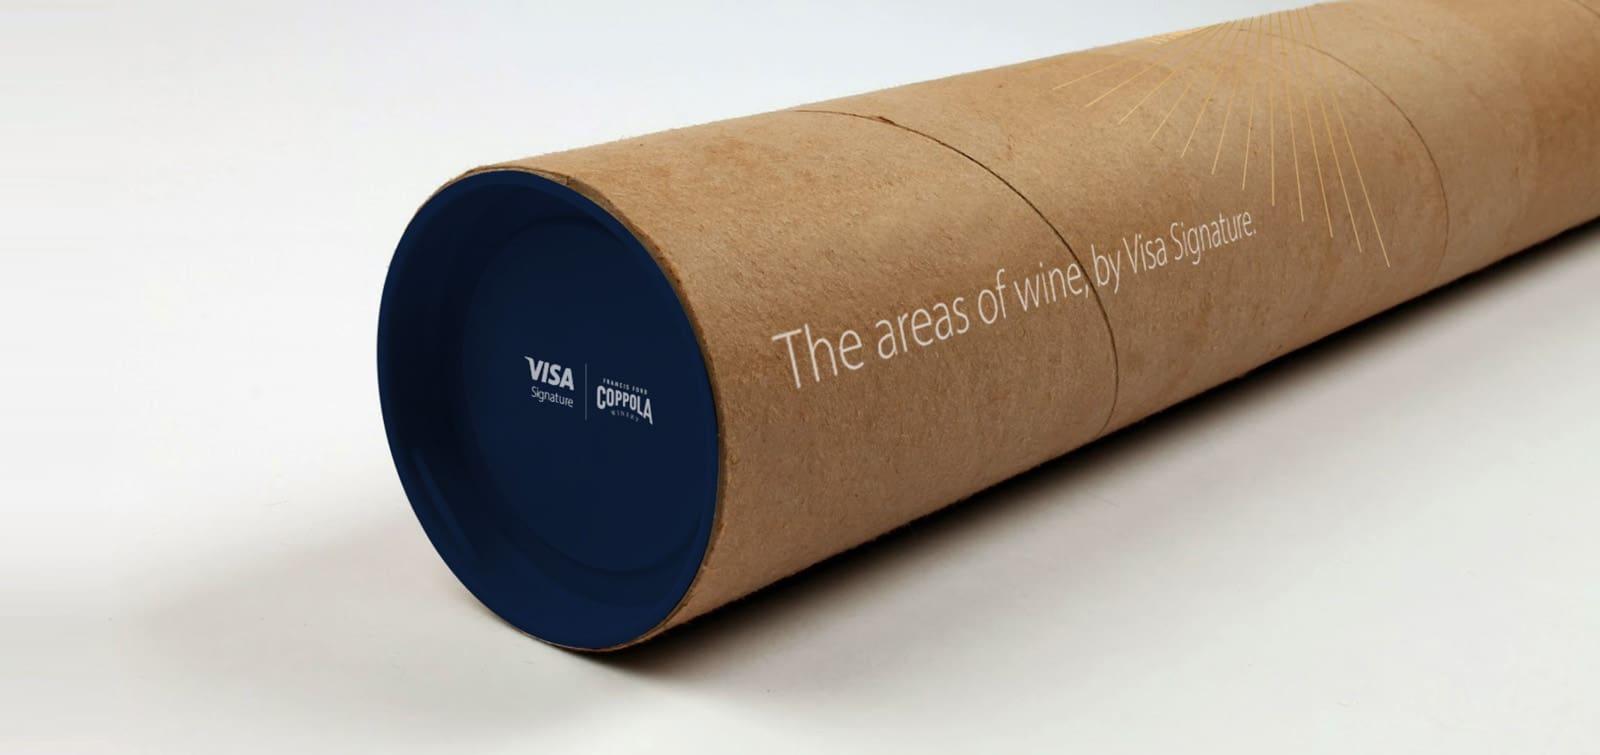 Visa Napa Valley Wineries - The areas of wine